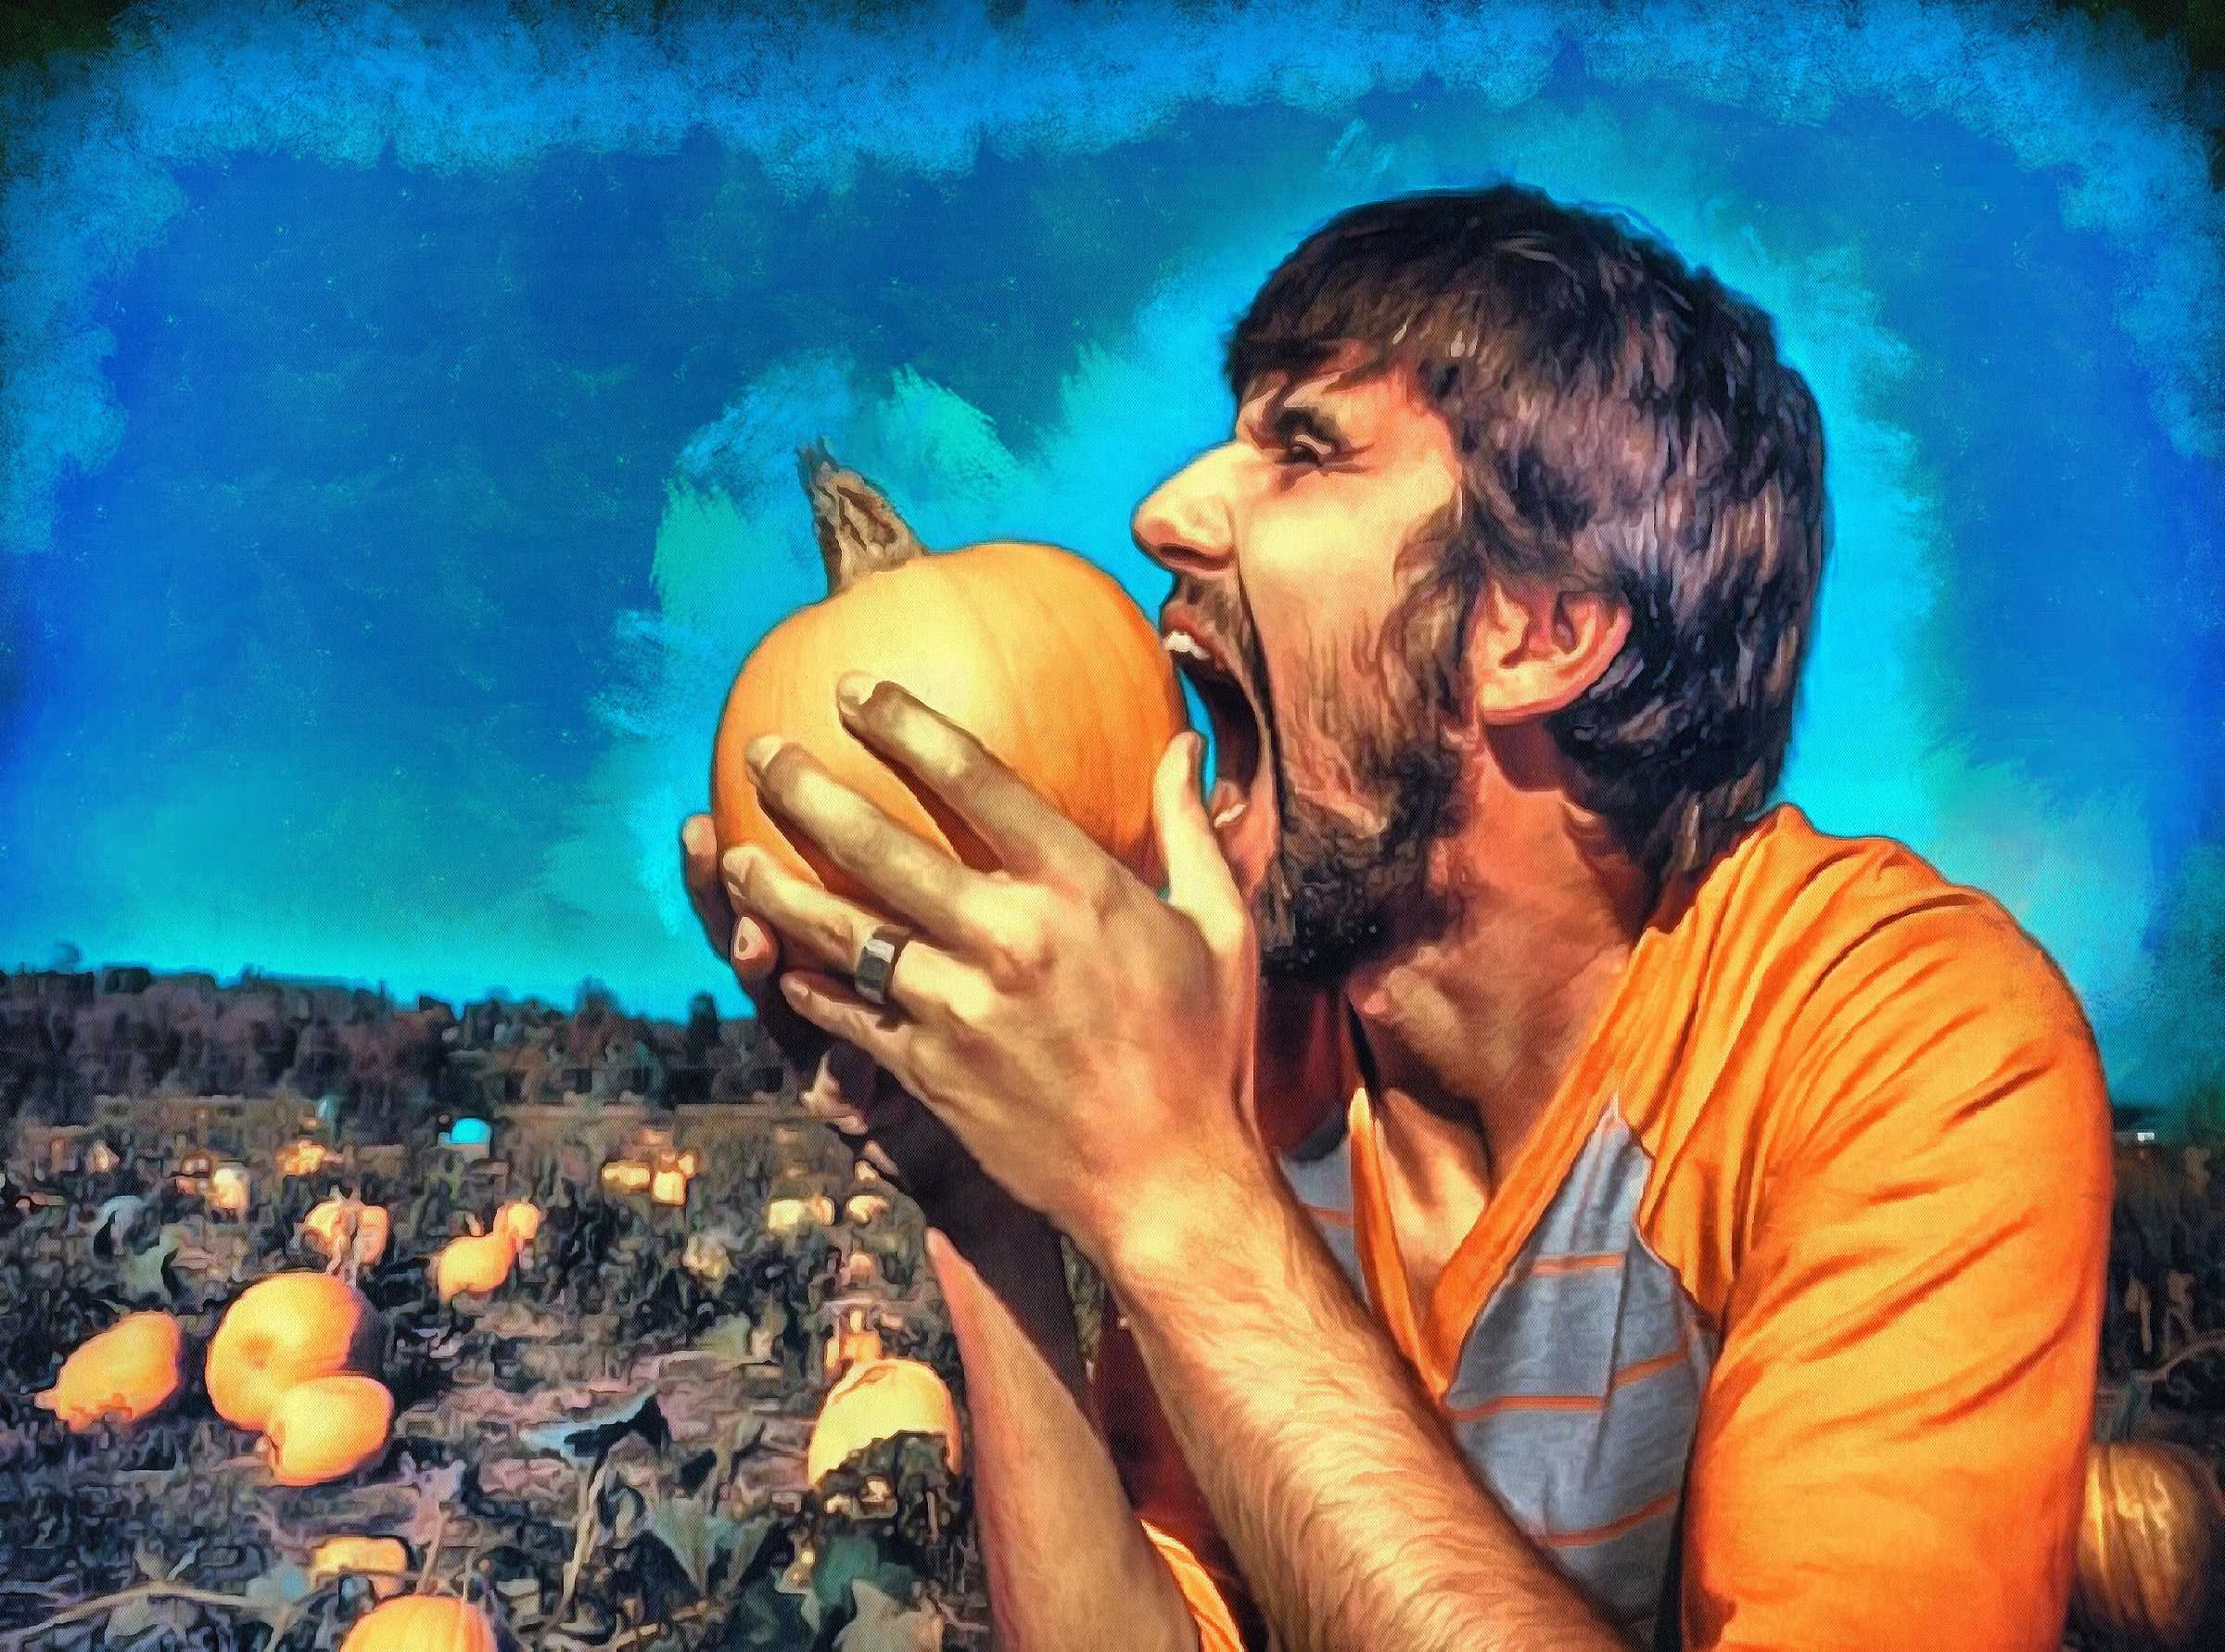 hungry, pumpkins, eat pumpkin, man, holiday,